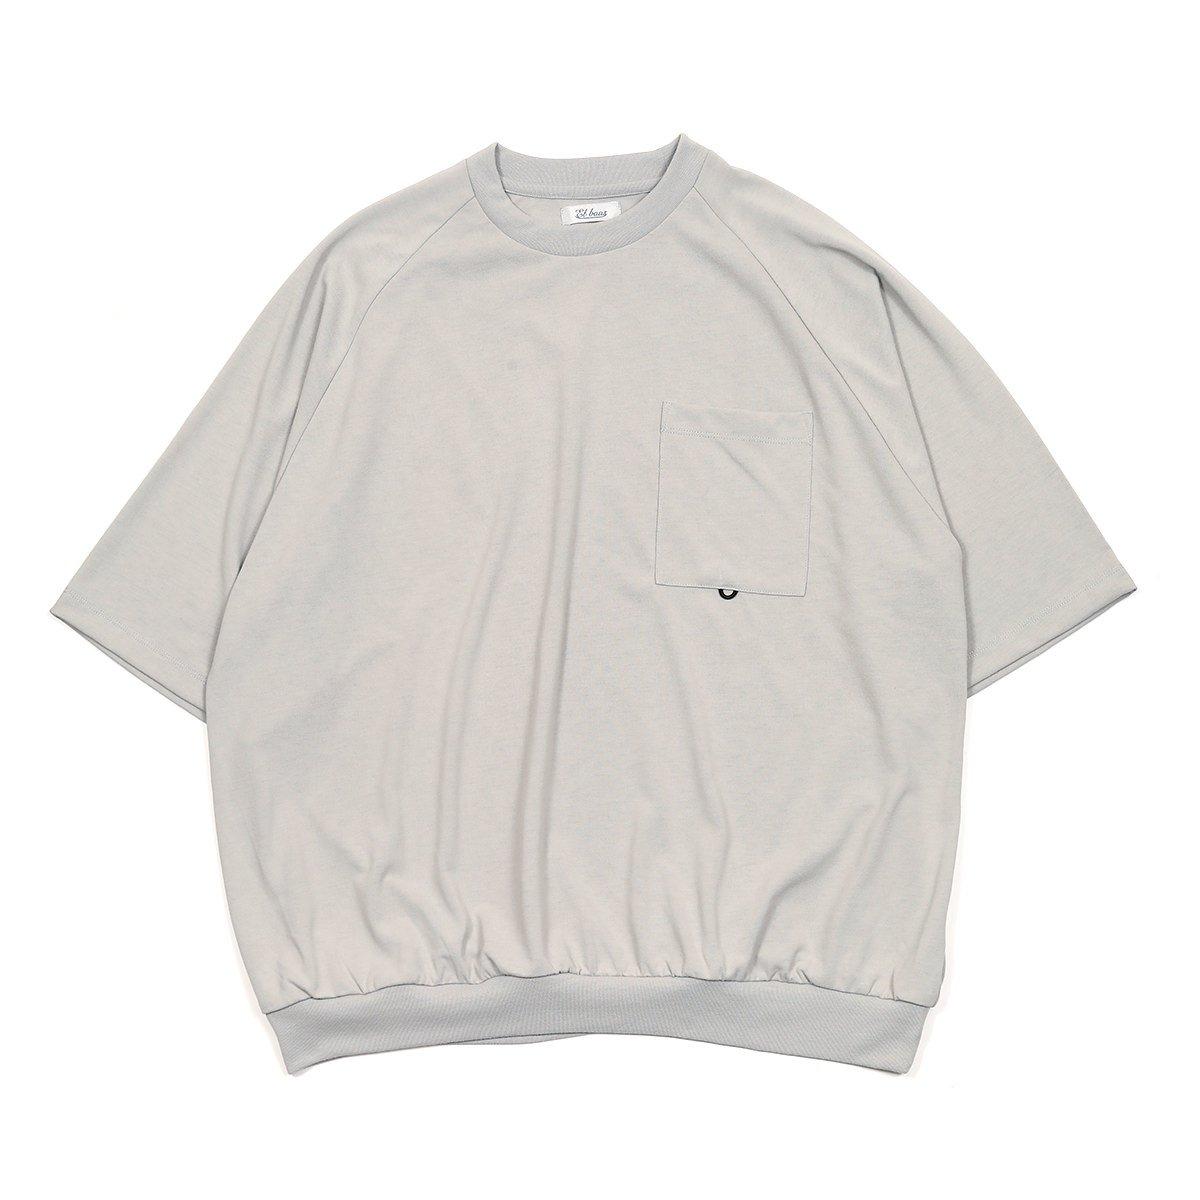 Short Sleeve RIB T-shirts 詳細画像17